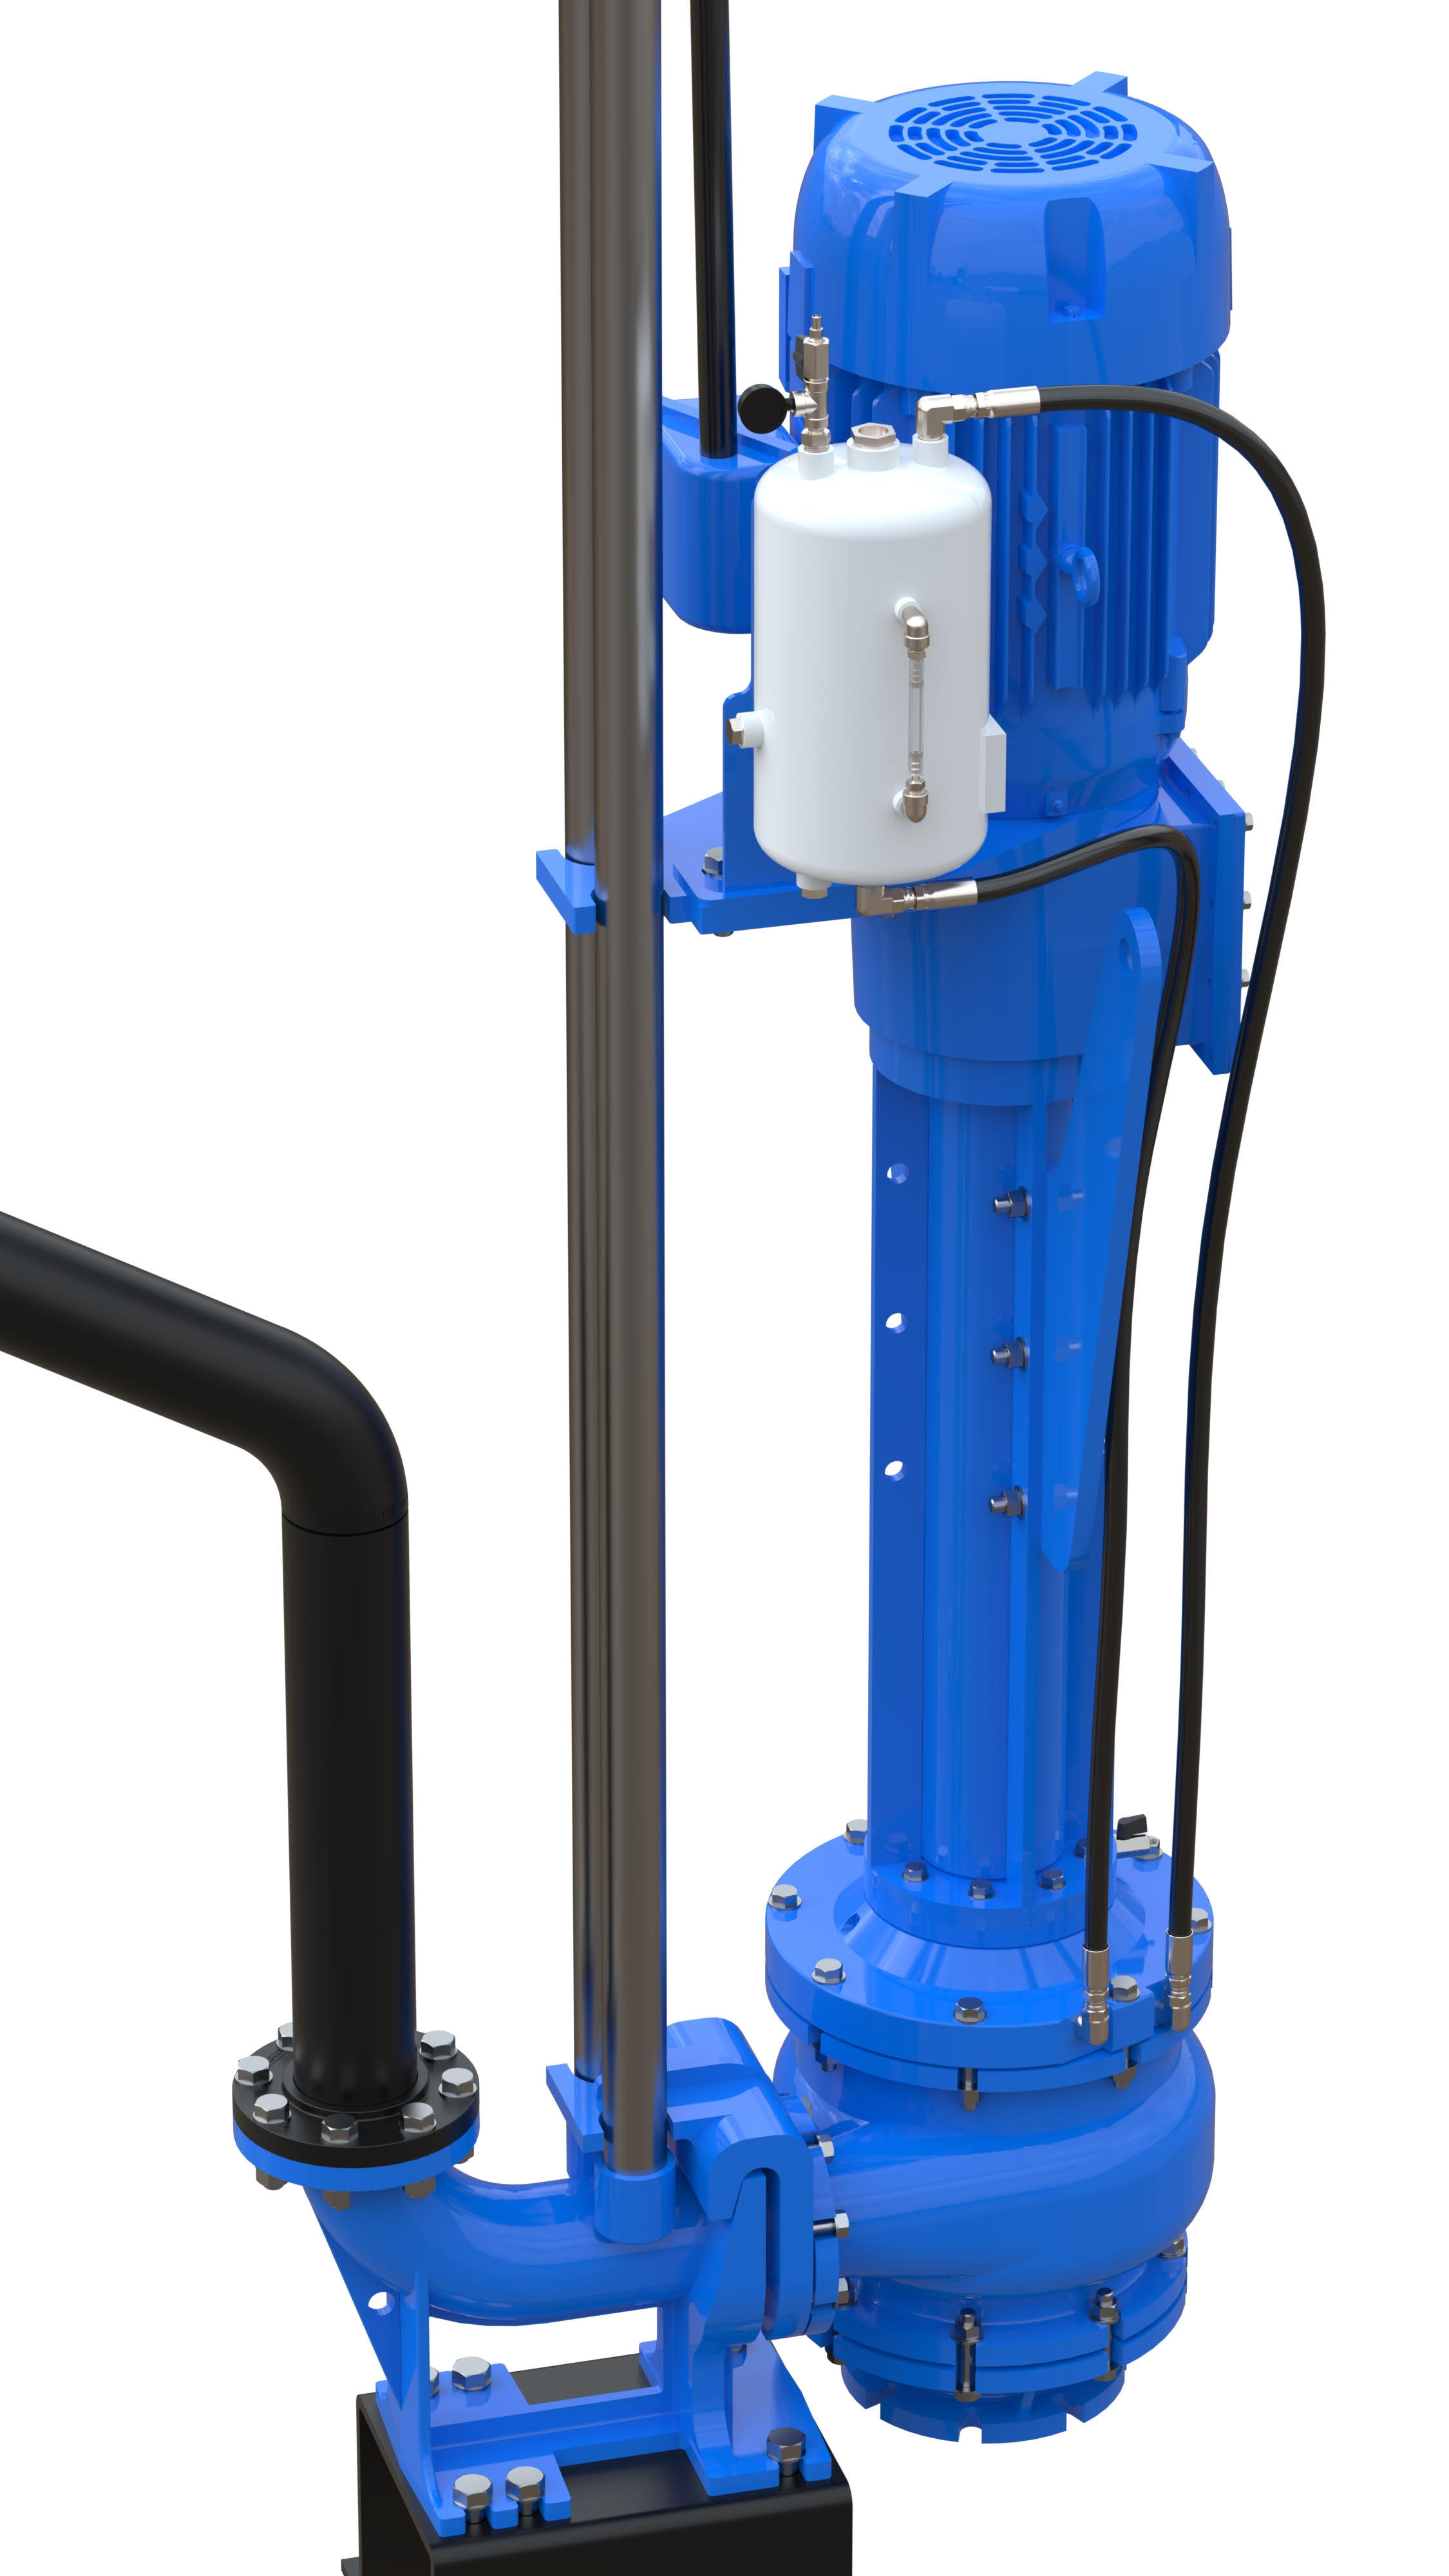 slurry pump for high solids